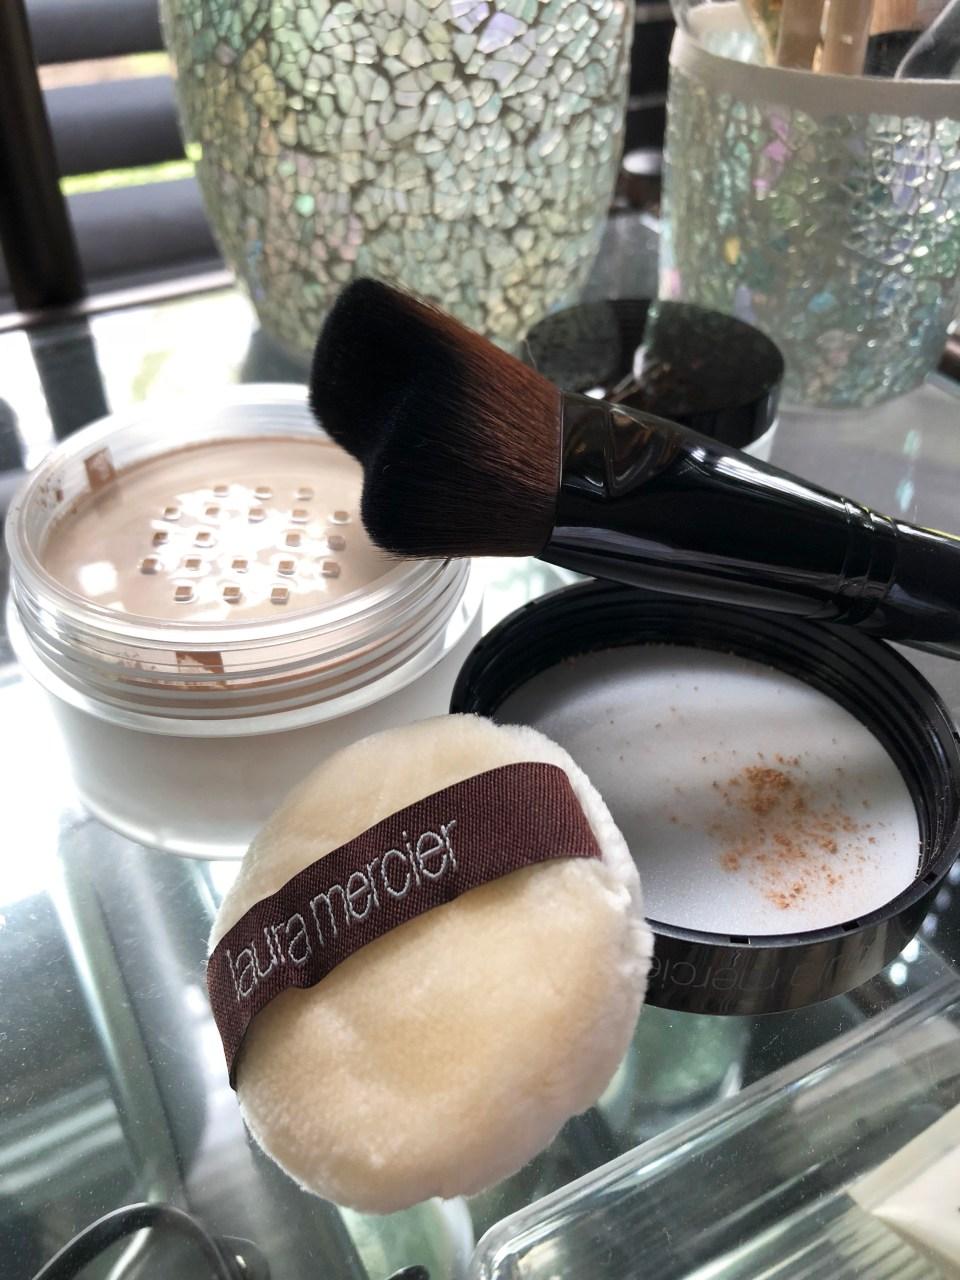 Laura Mercier Translucent Powder + brush 2